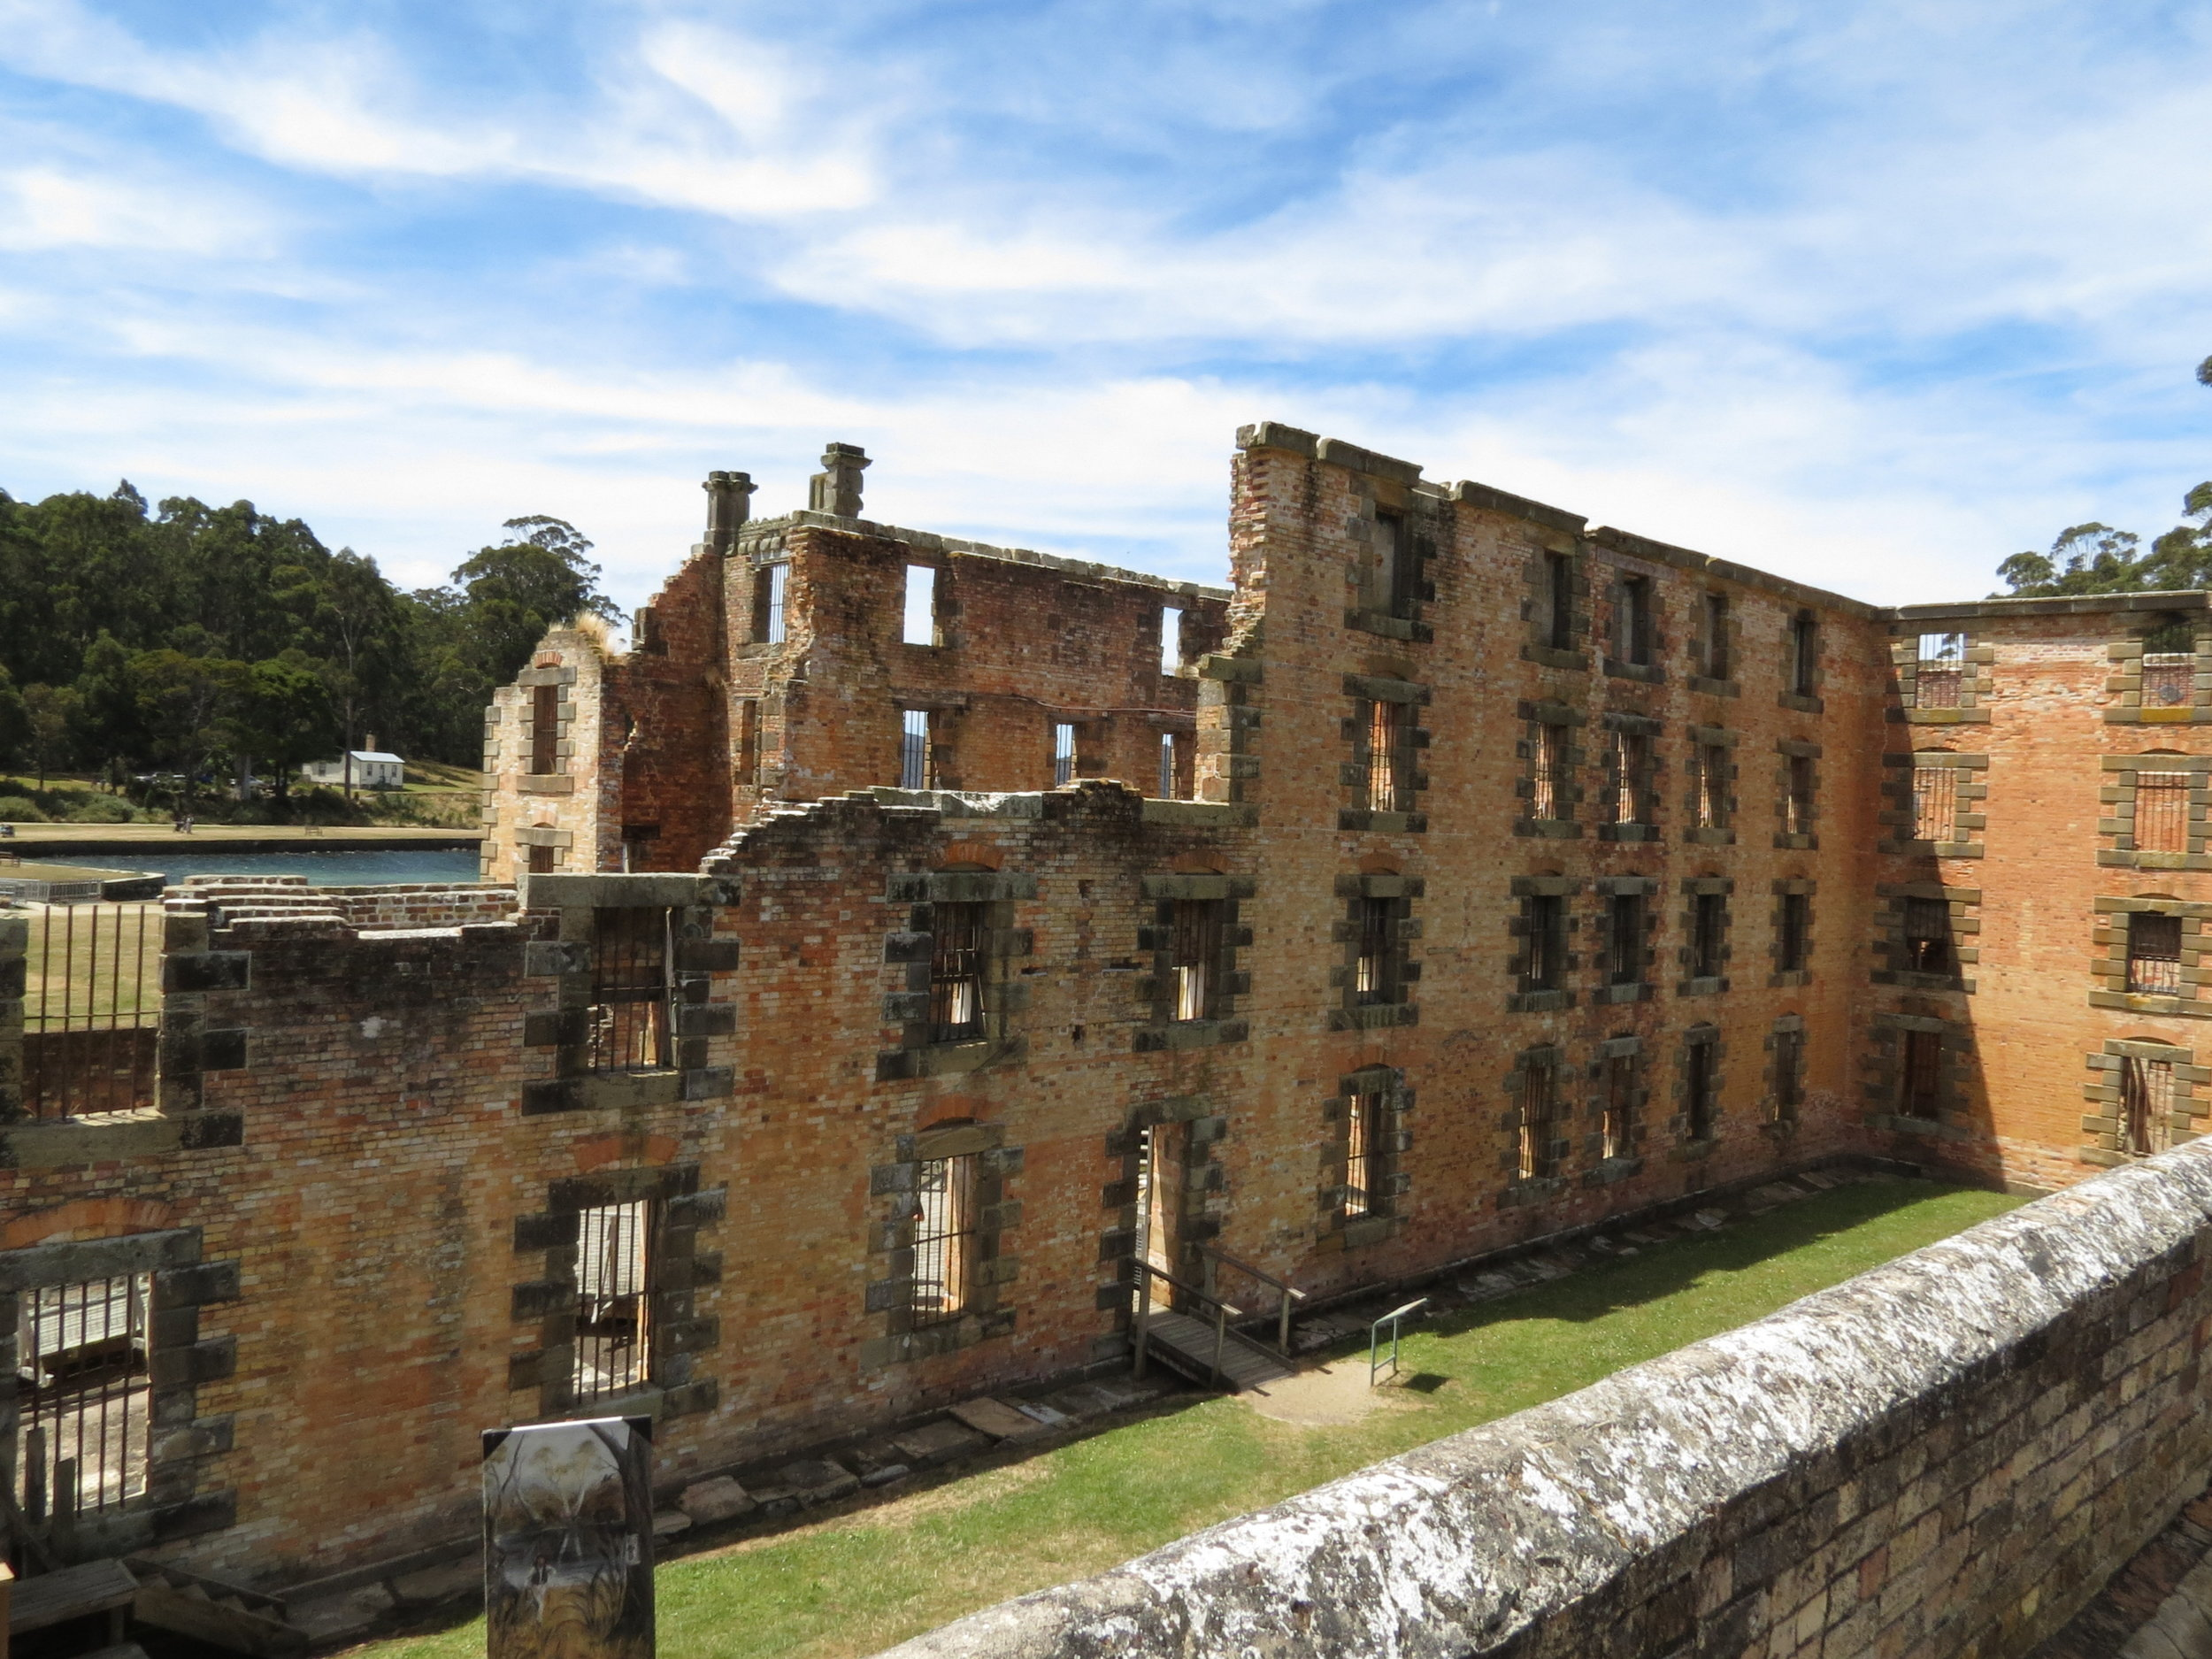 Ruins of prison at Port Arthur World Heritage Site